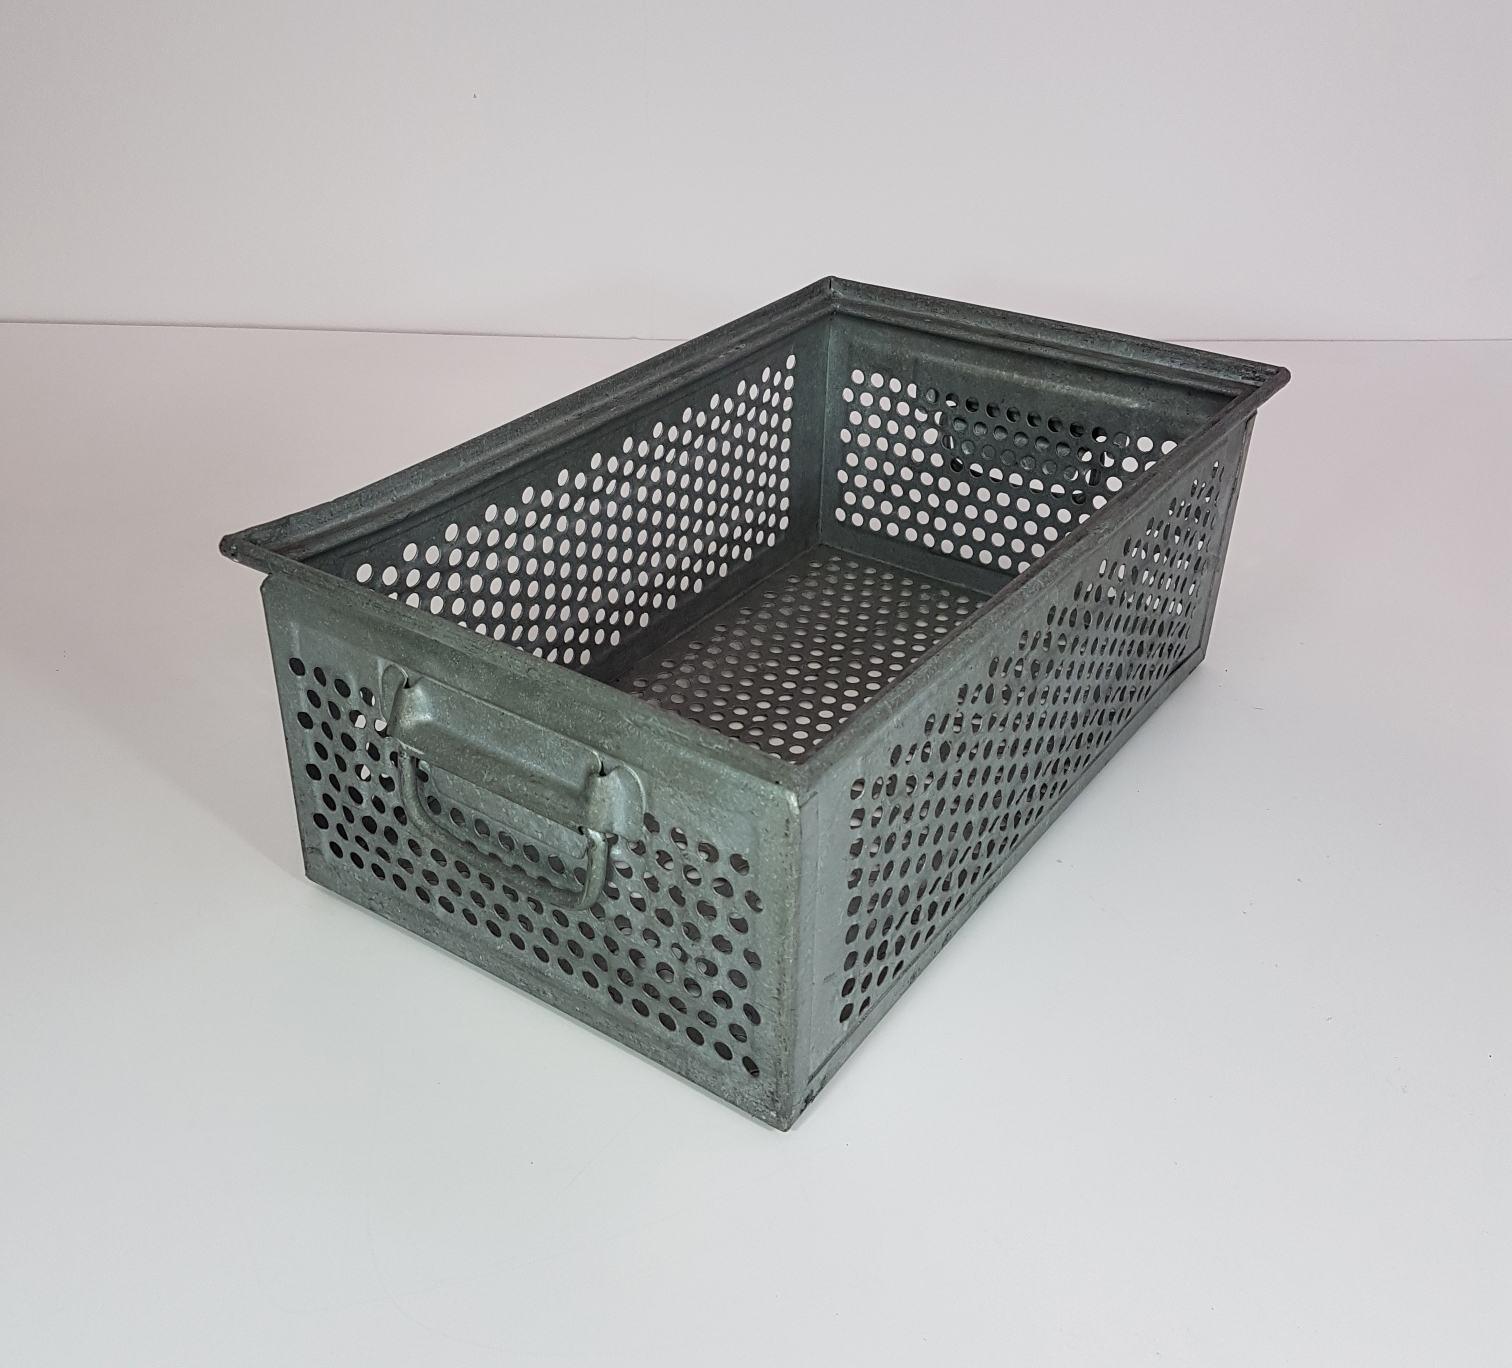 stapelkisten aus metall sch ferkisten typ 14 6 a verzinkt gelocht gebraucht zierhut. Black Bedroom Furniture Sets. Home Design Ideas